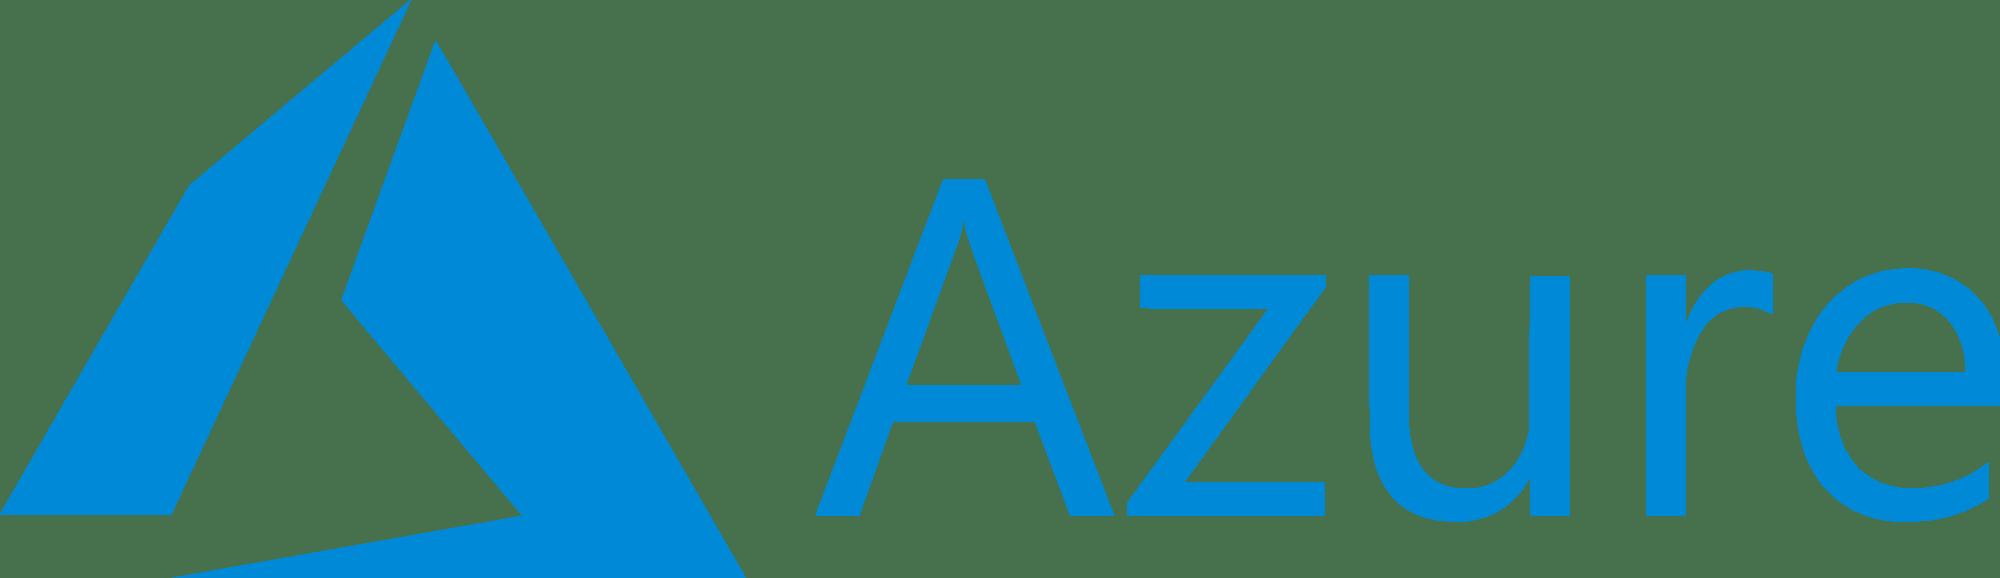 Microsoft Wechselbonus Azure